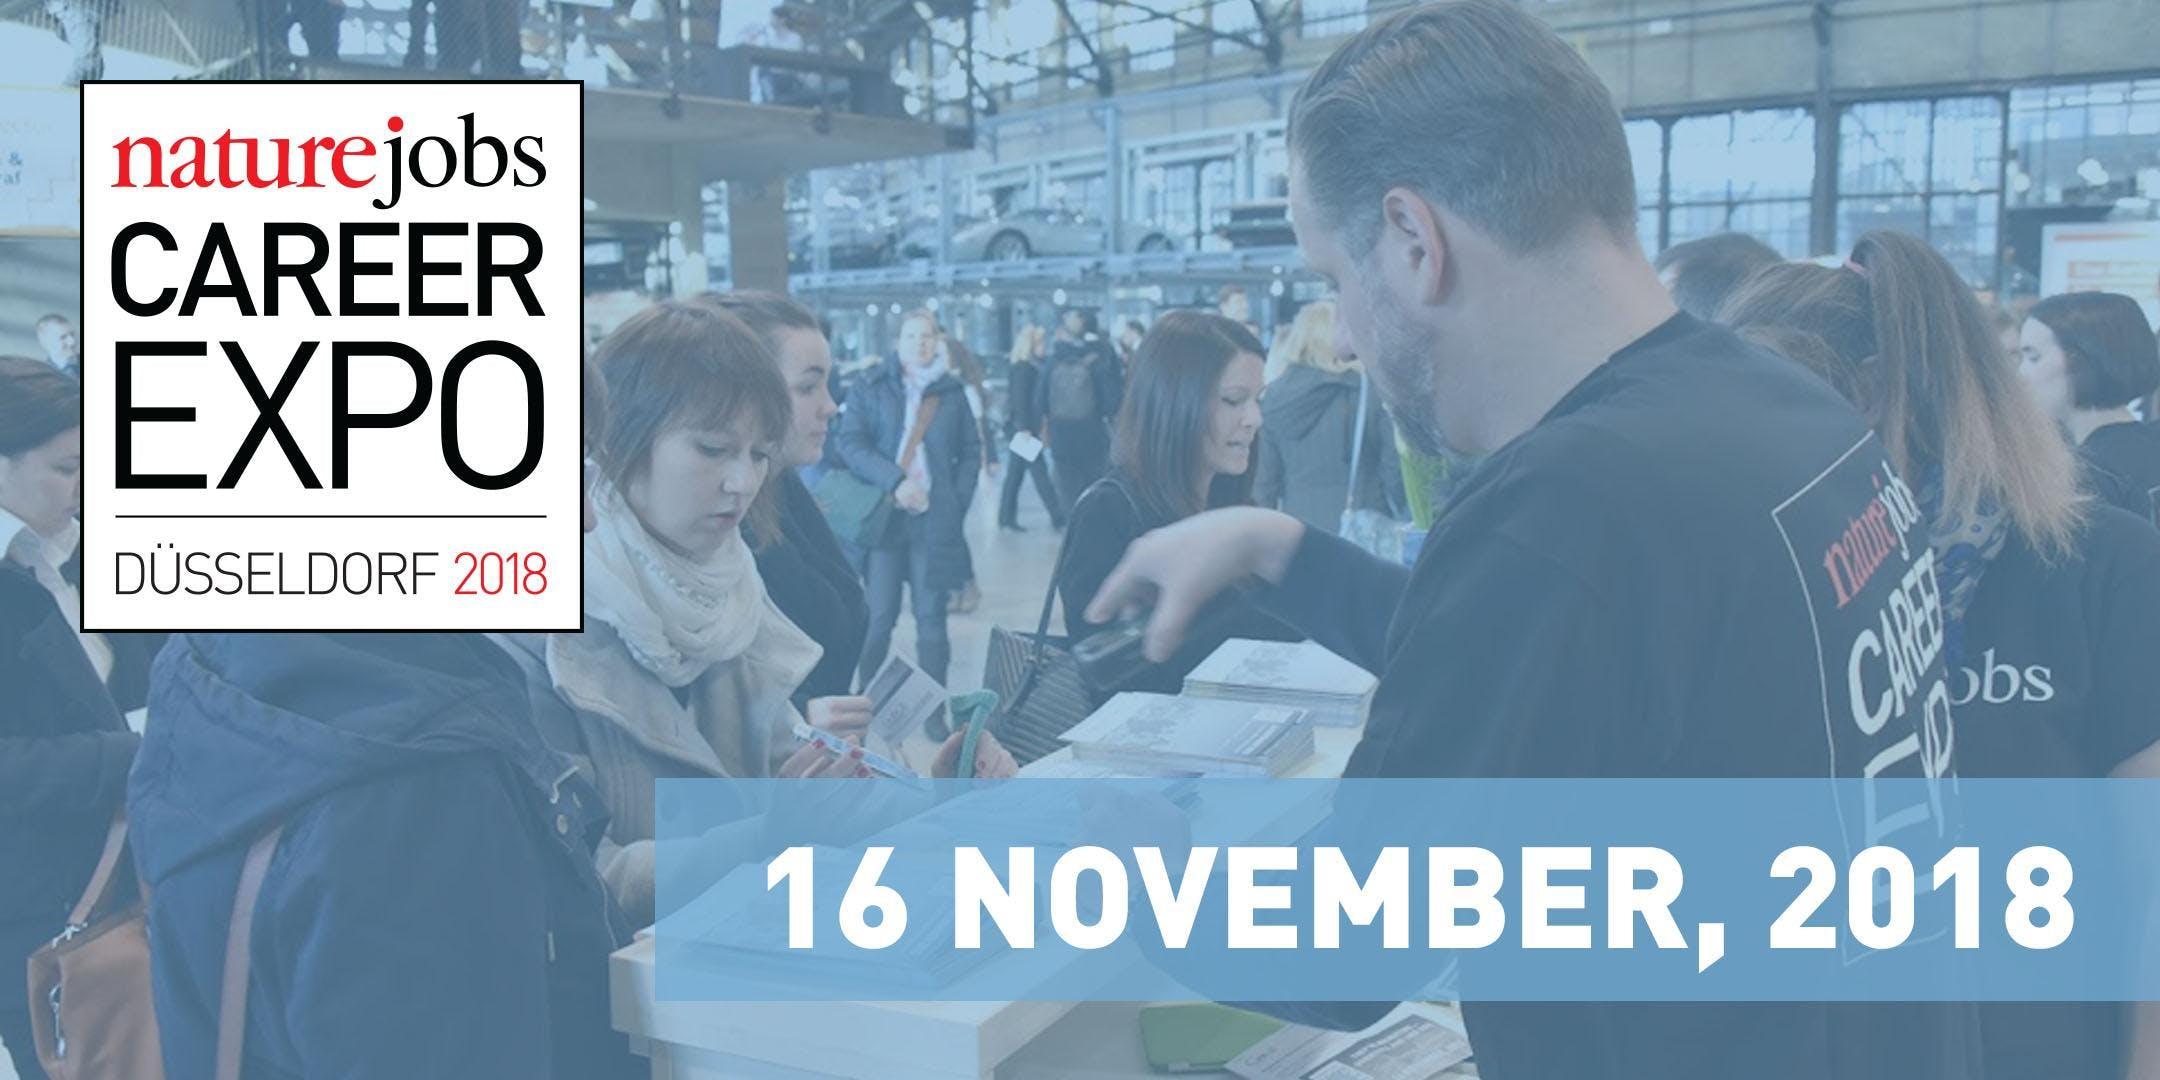 Naturejobs Career Expo Düsseldorf / Friday, November 16 9:30 AM - 5